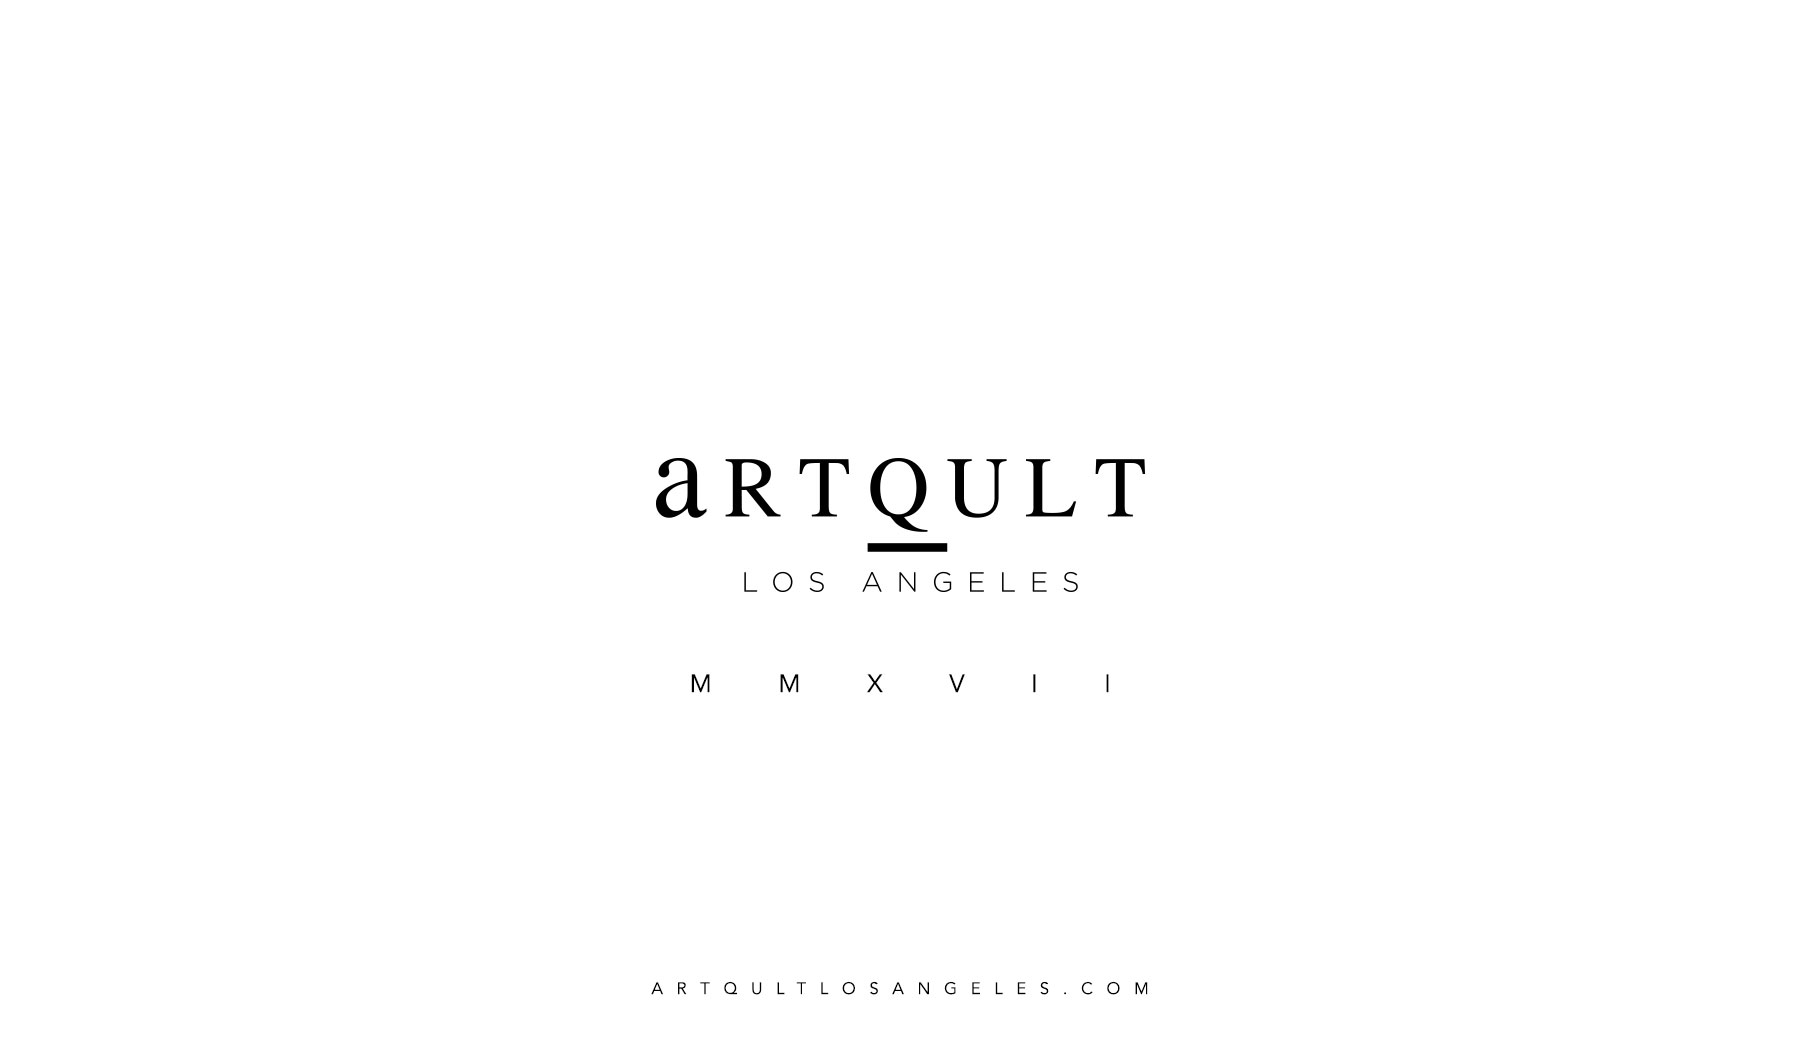 ARTQULT-LOS-ANGELES-LOOKBOOK-1.jpg